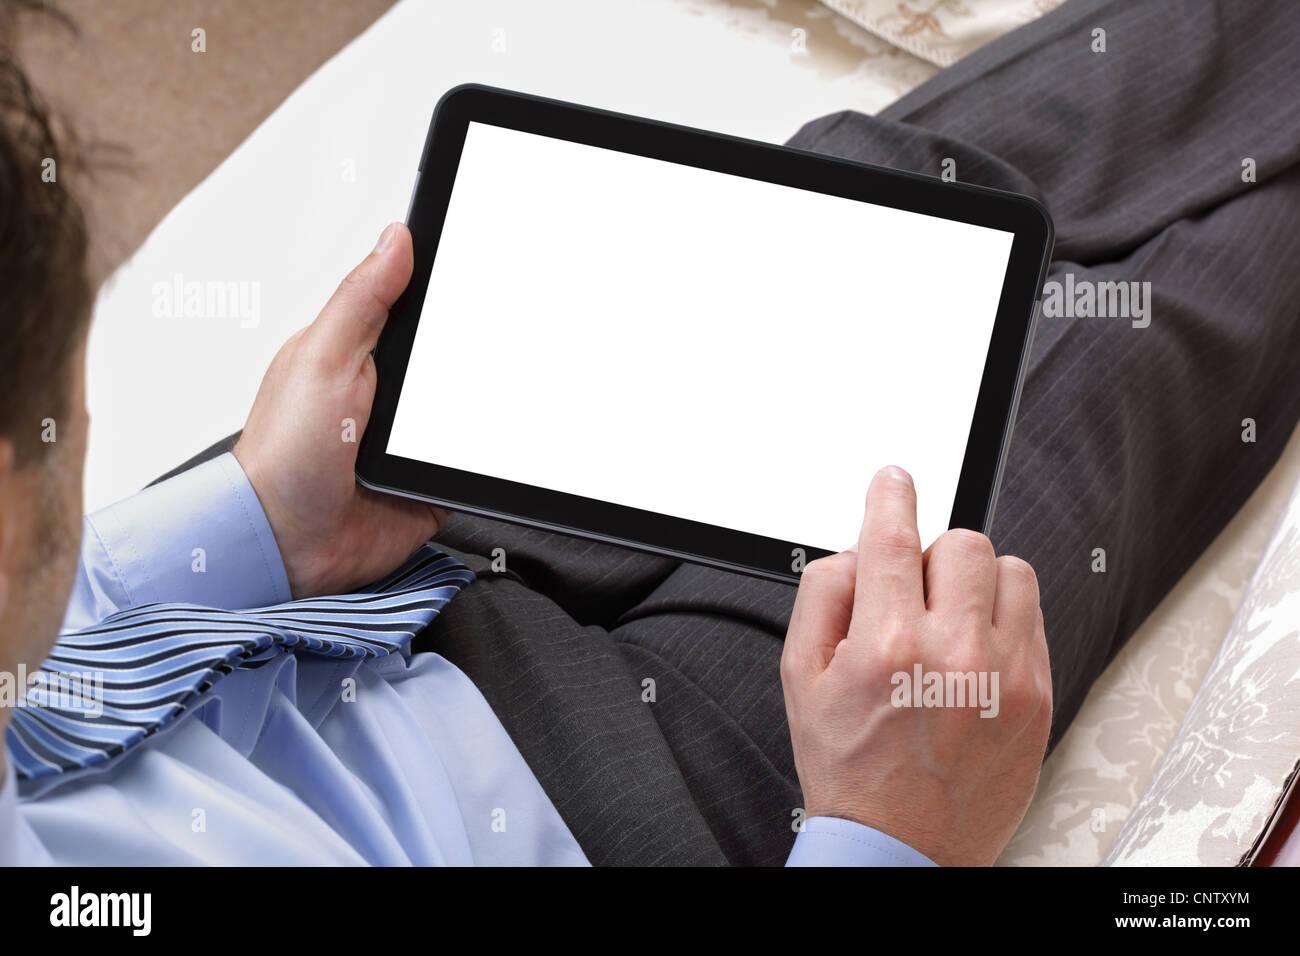 Digital tablet - Stock Image